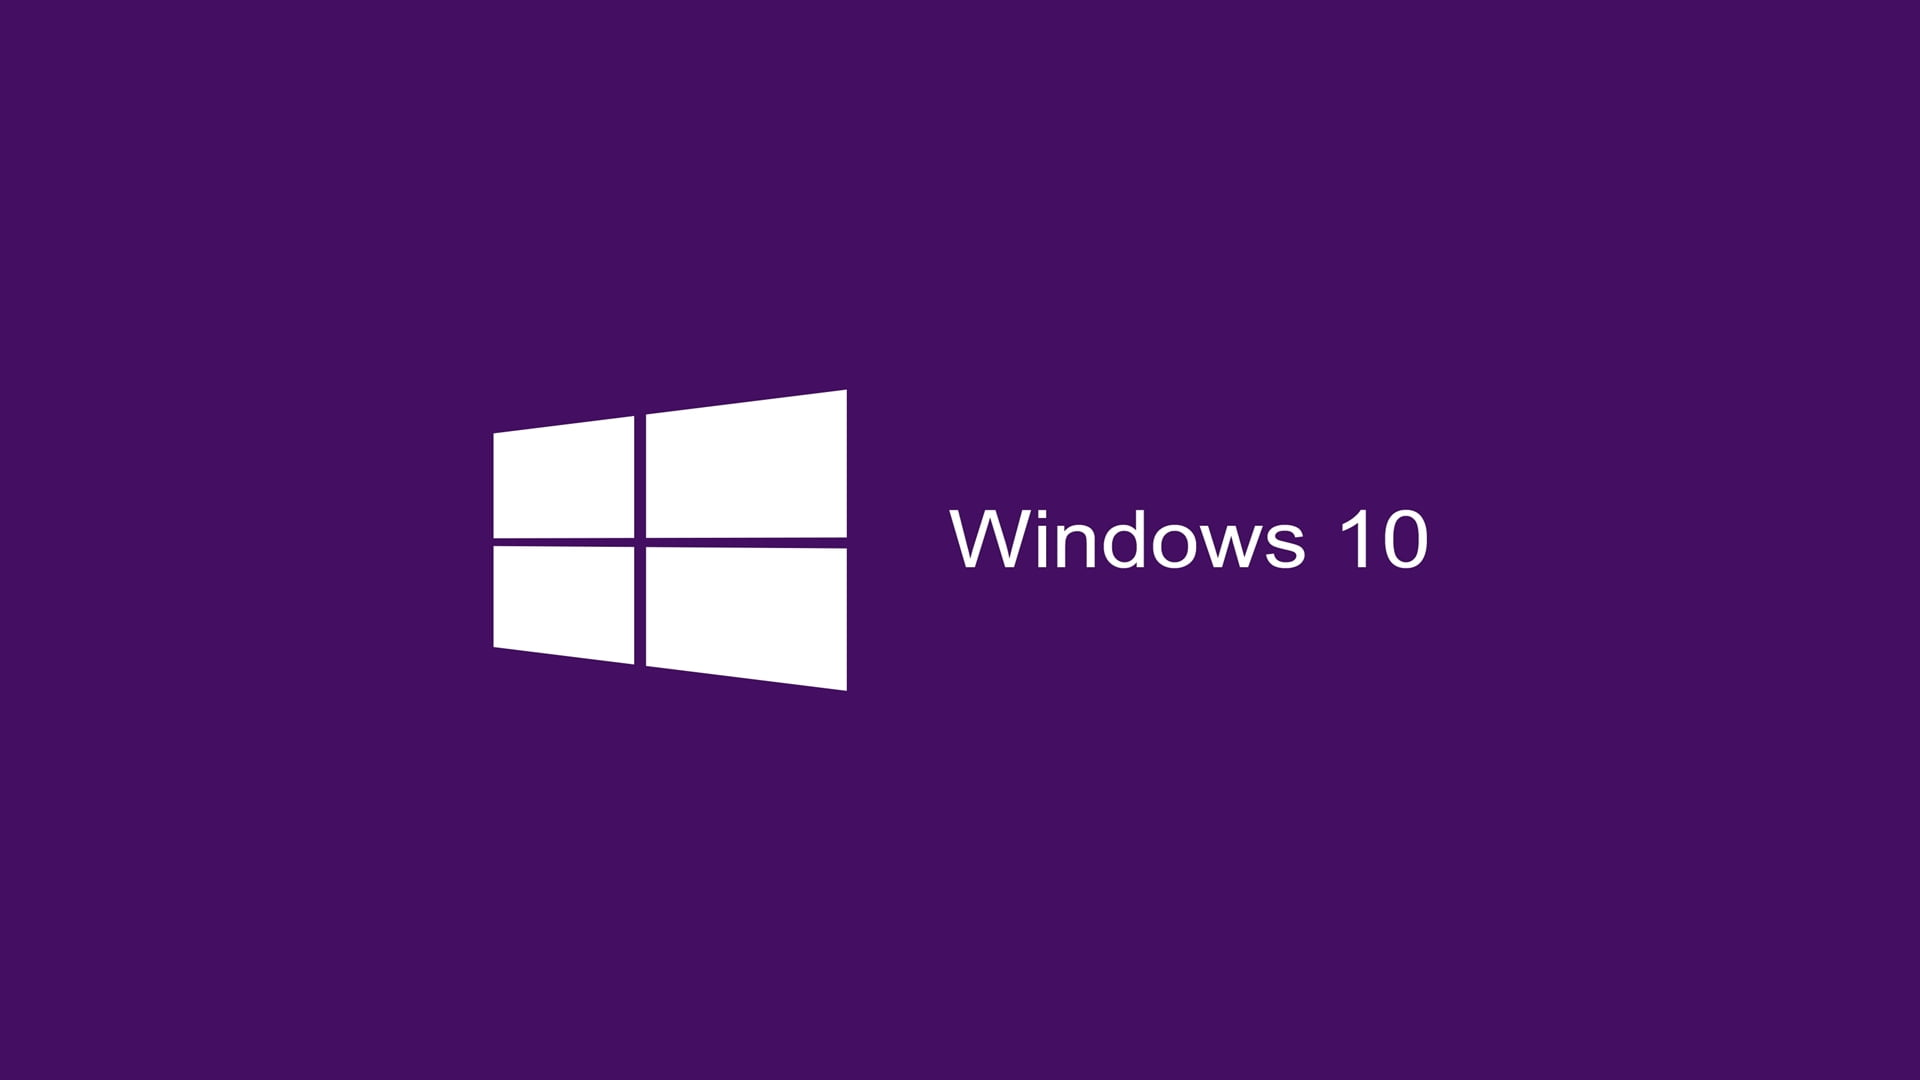 Papéis de parede do Windows 10 13